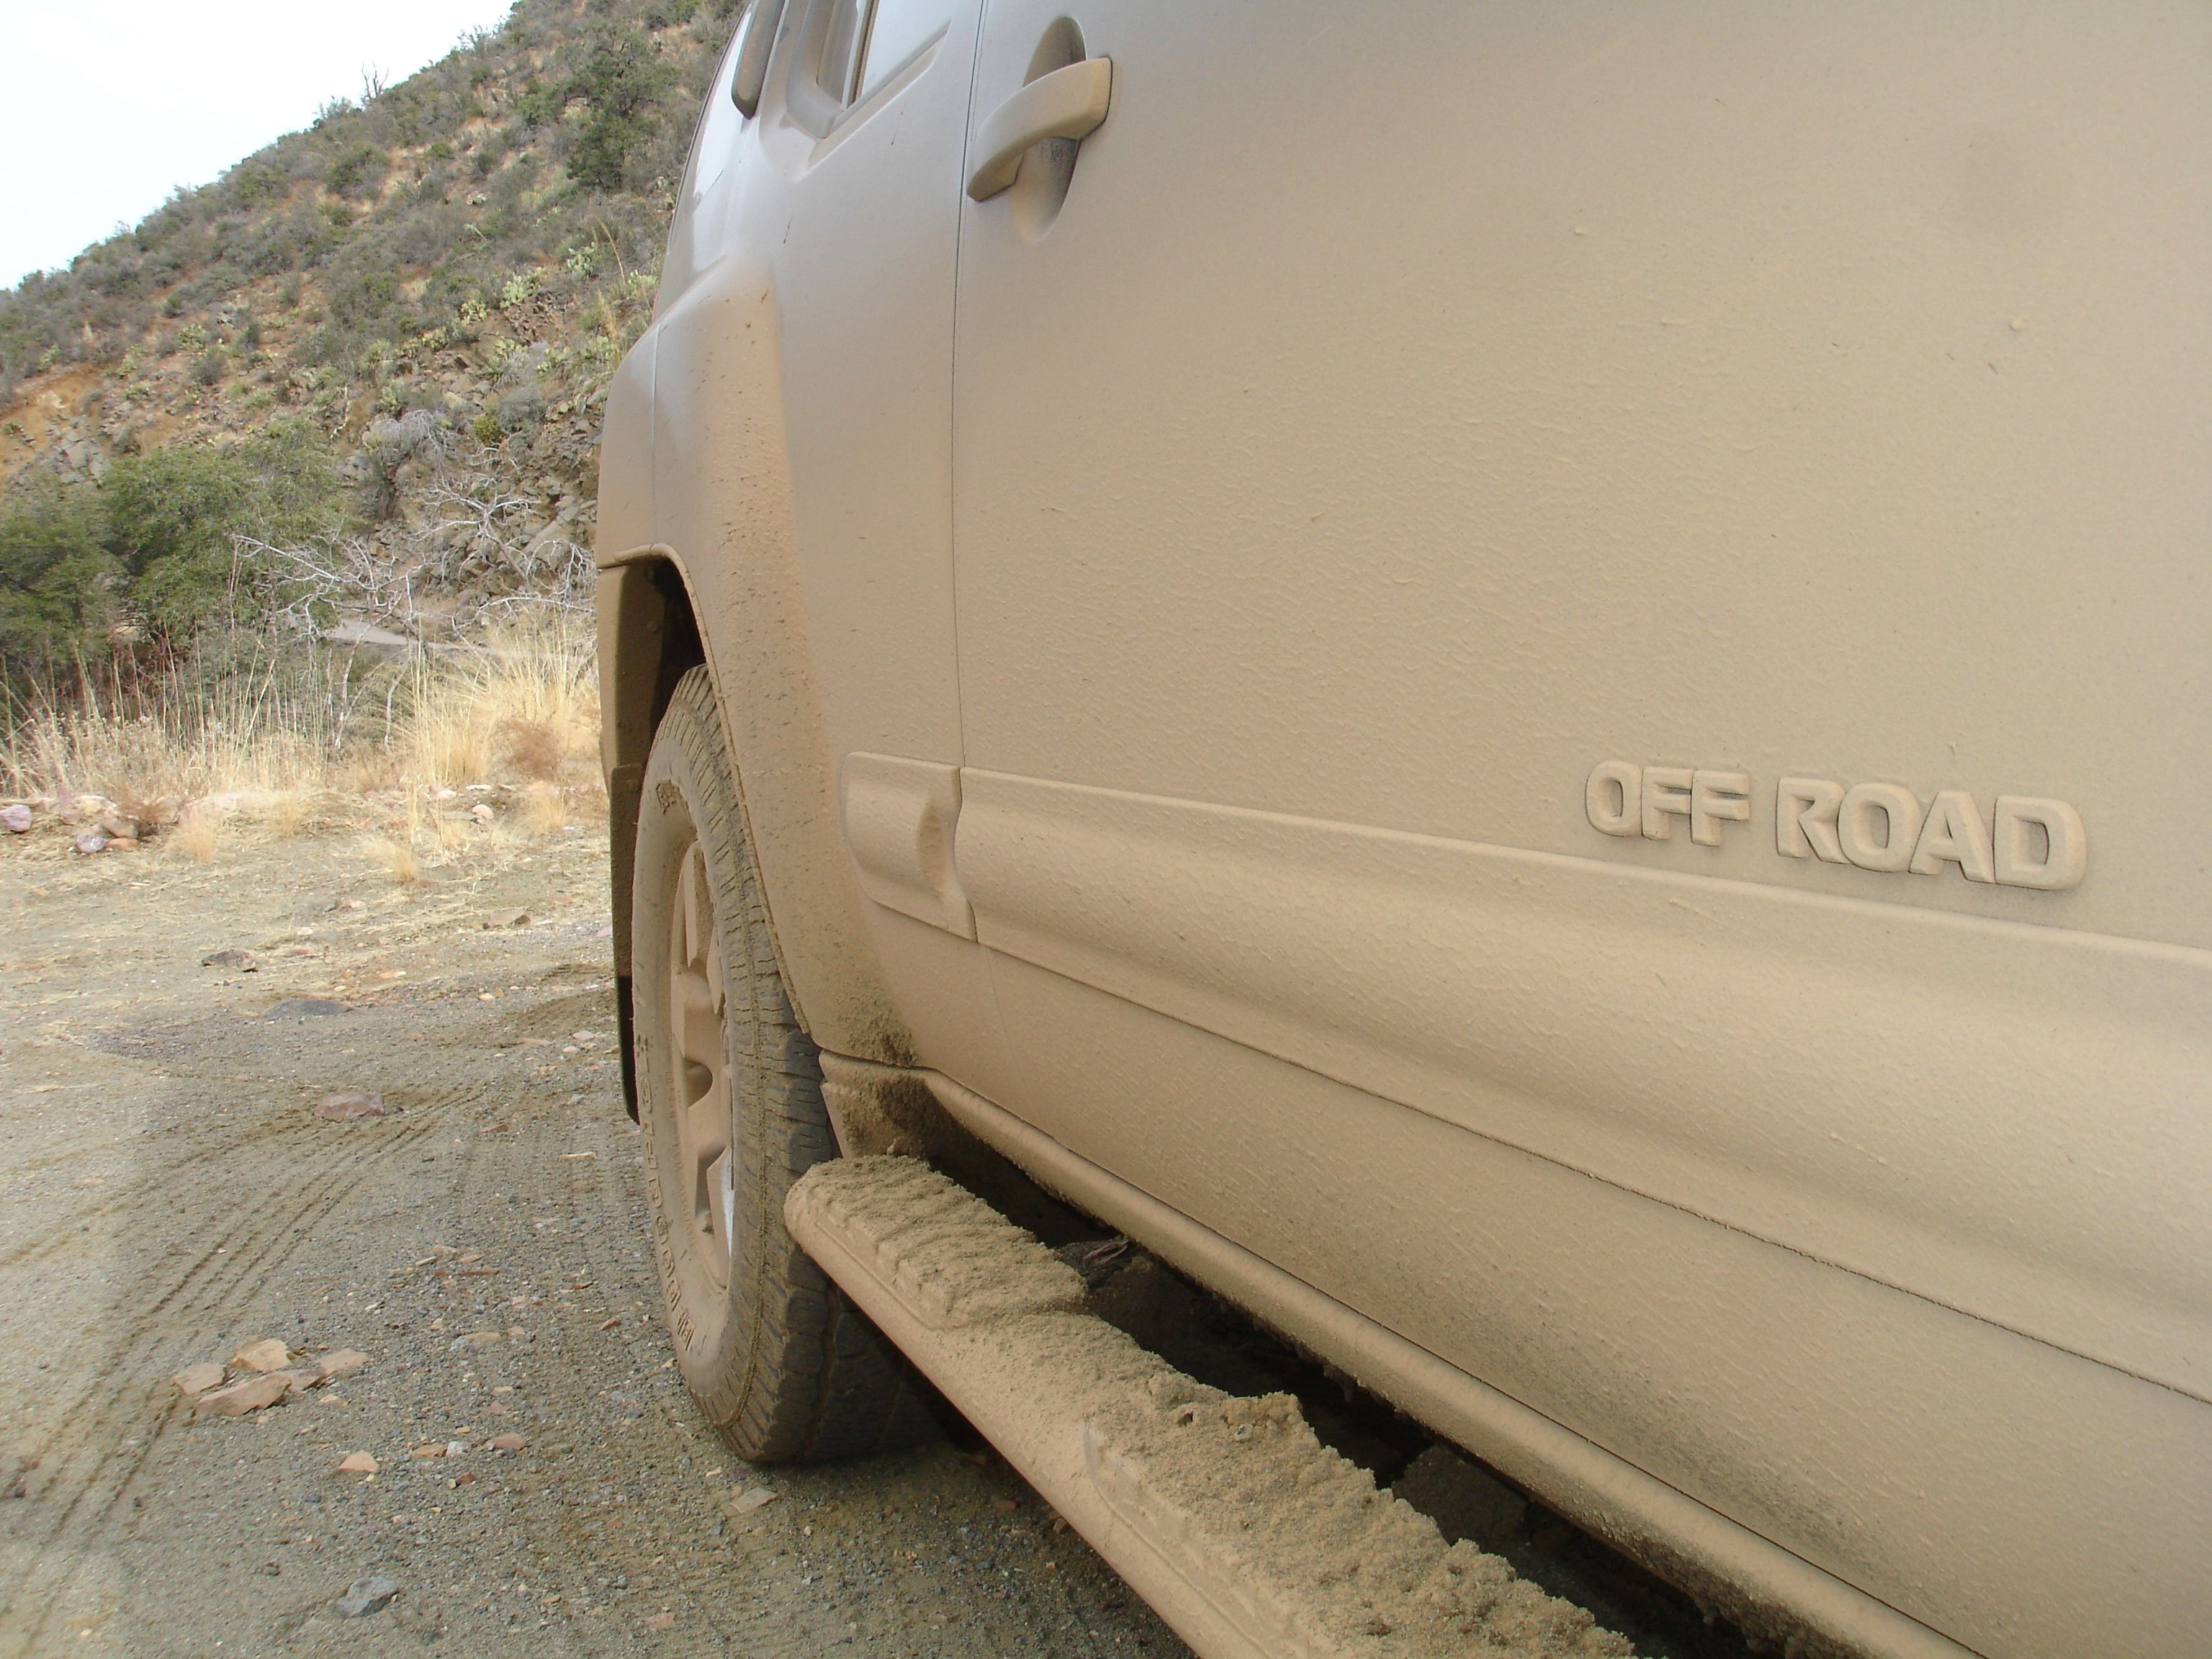 Off road in Arizona - photo of black Nissan Xterra by Catherina Severin